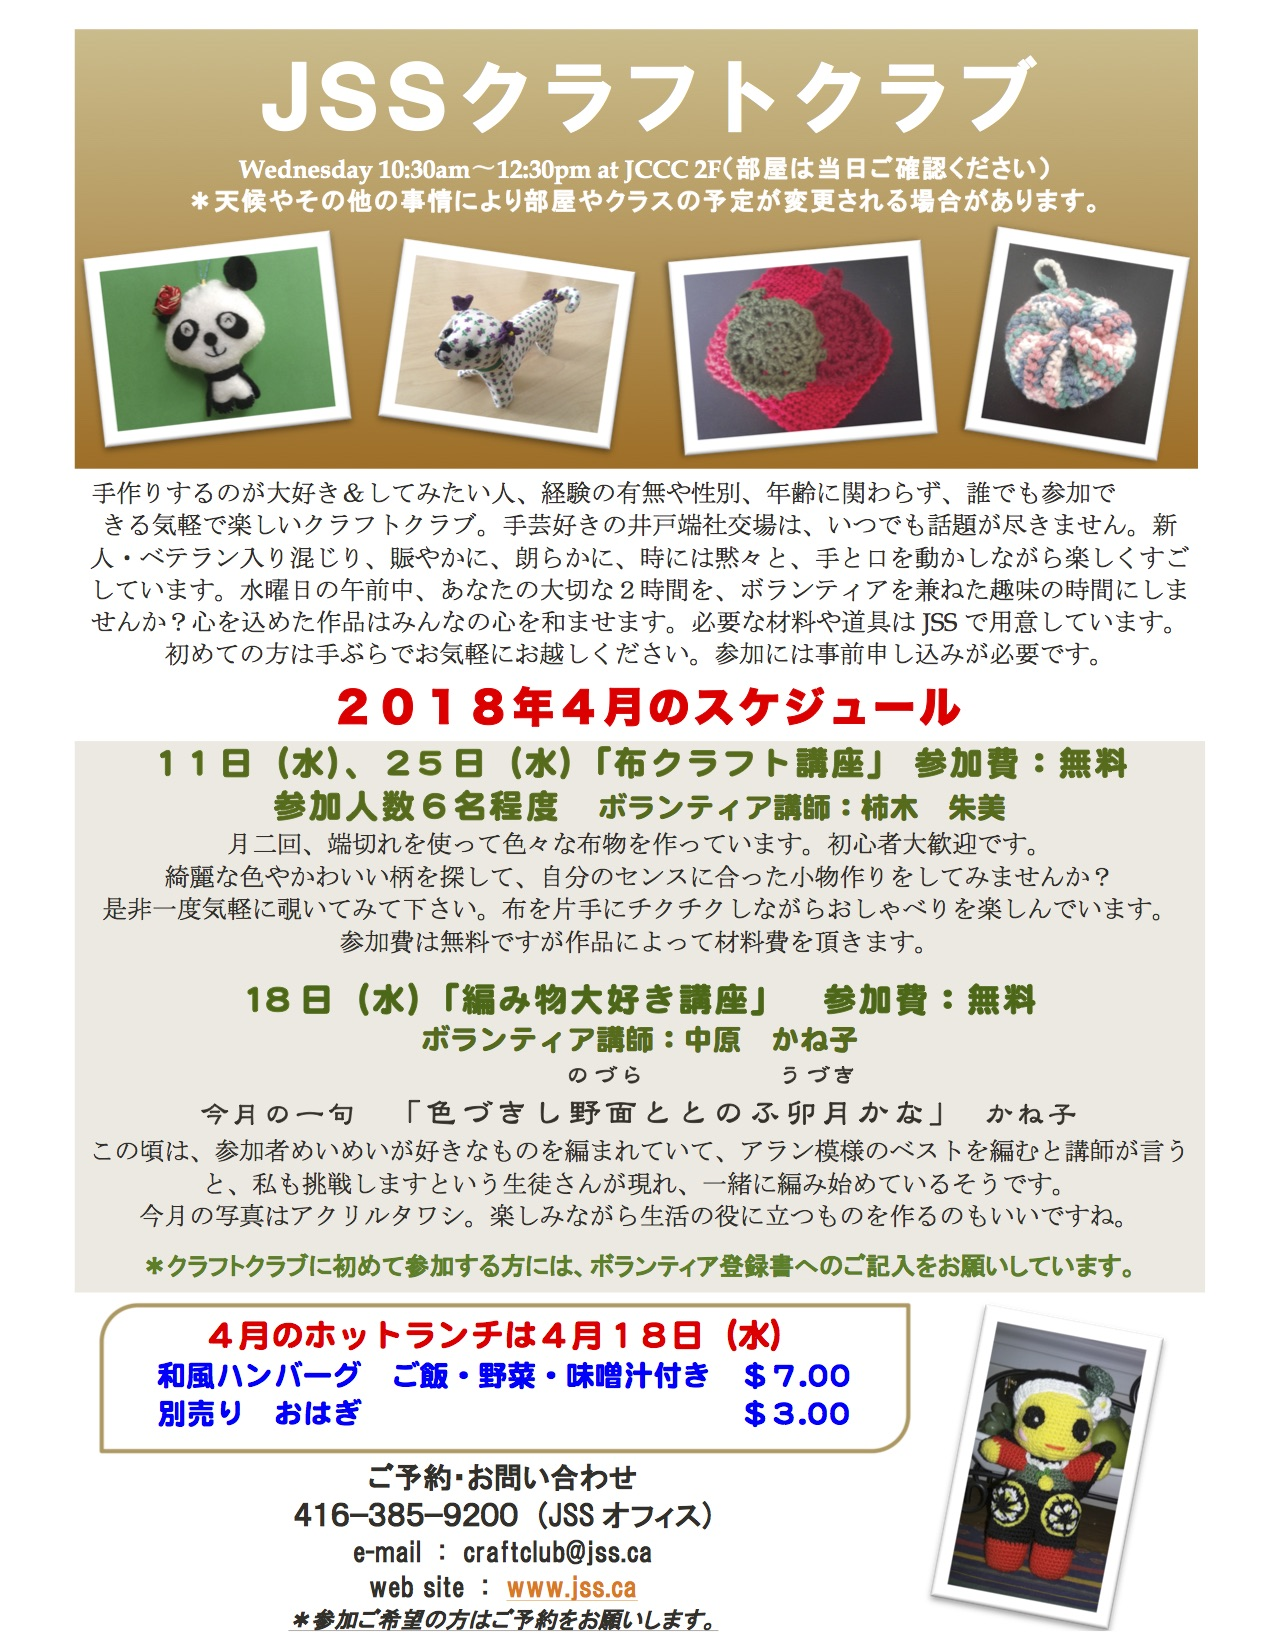 [:ja]JSS クラフトクラブ 4月の予定[:en]JSS Craft Club Schedule - April[:]